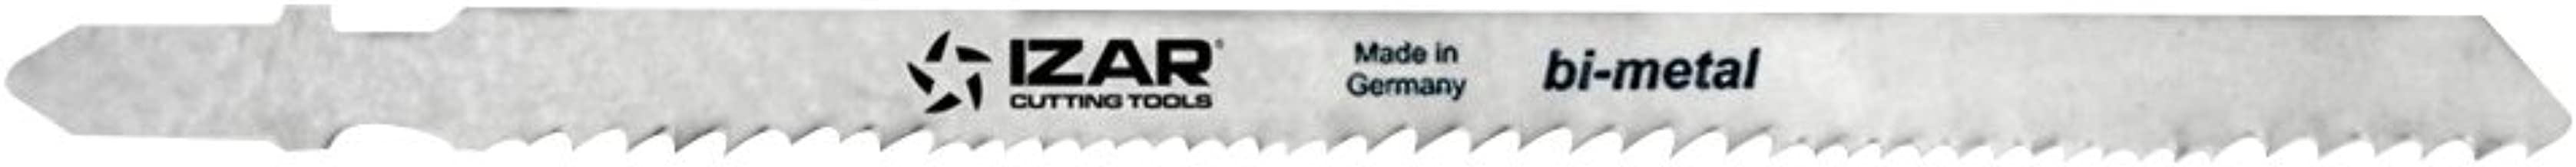 Izar 1930 - Sierra calar especial universal 00010 bimetal 5u